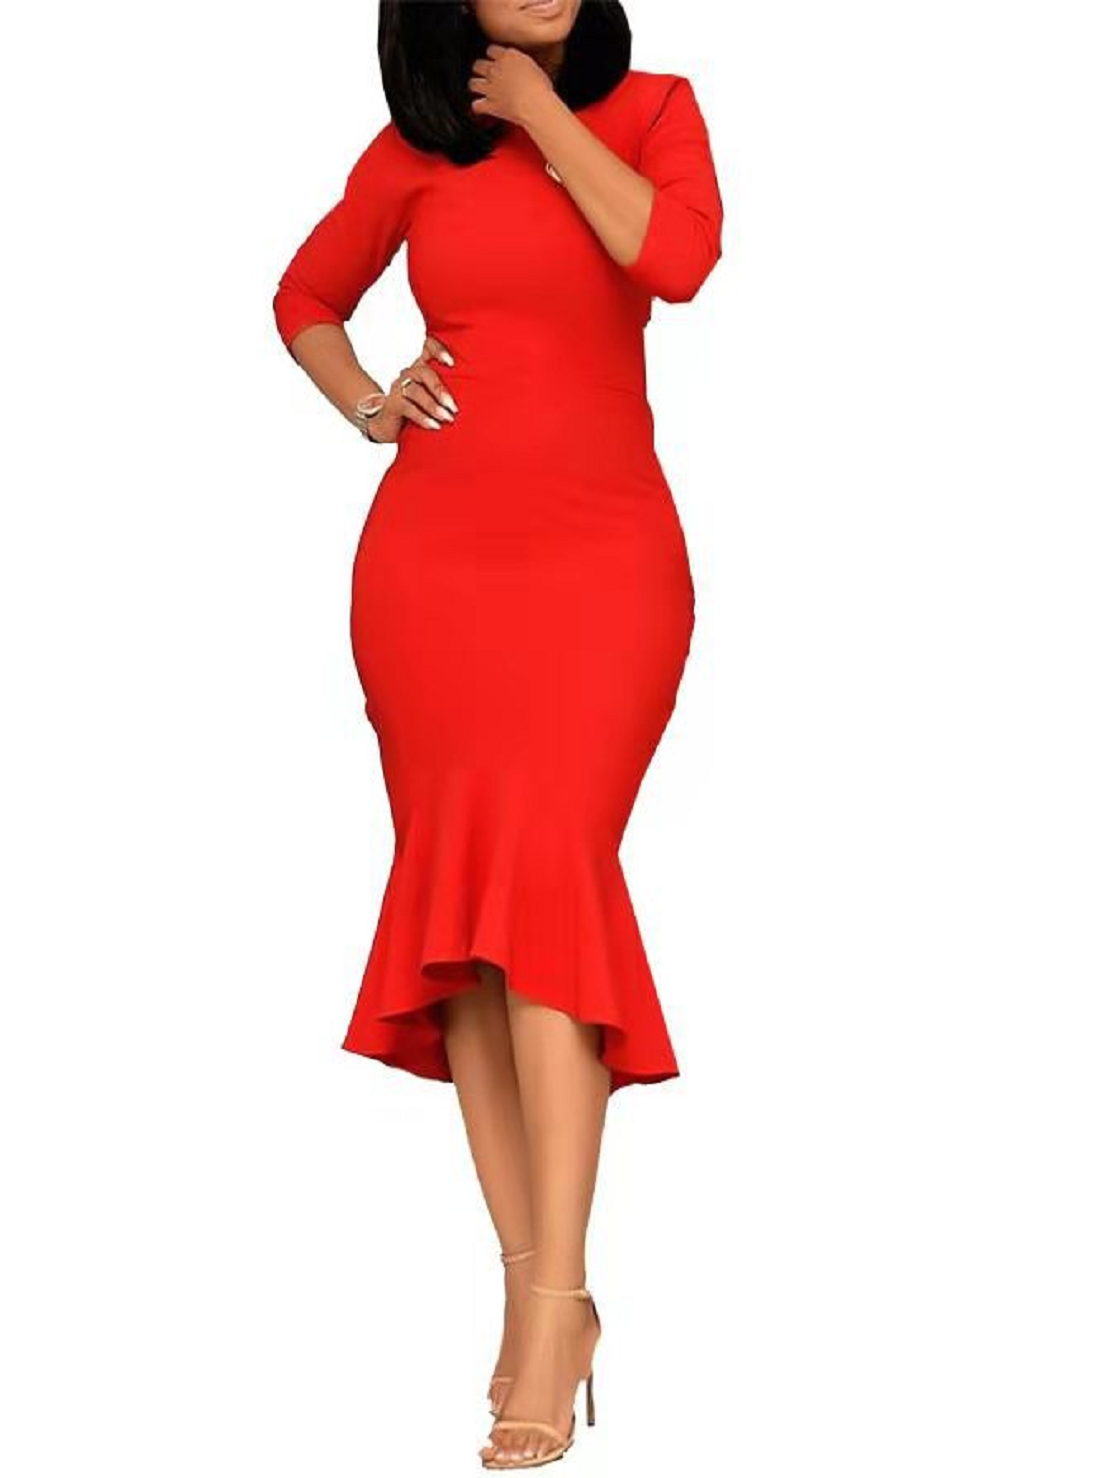 Wholesale Plus Size Red Dress